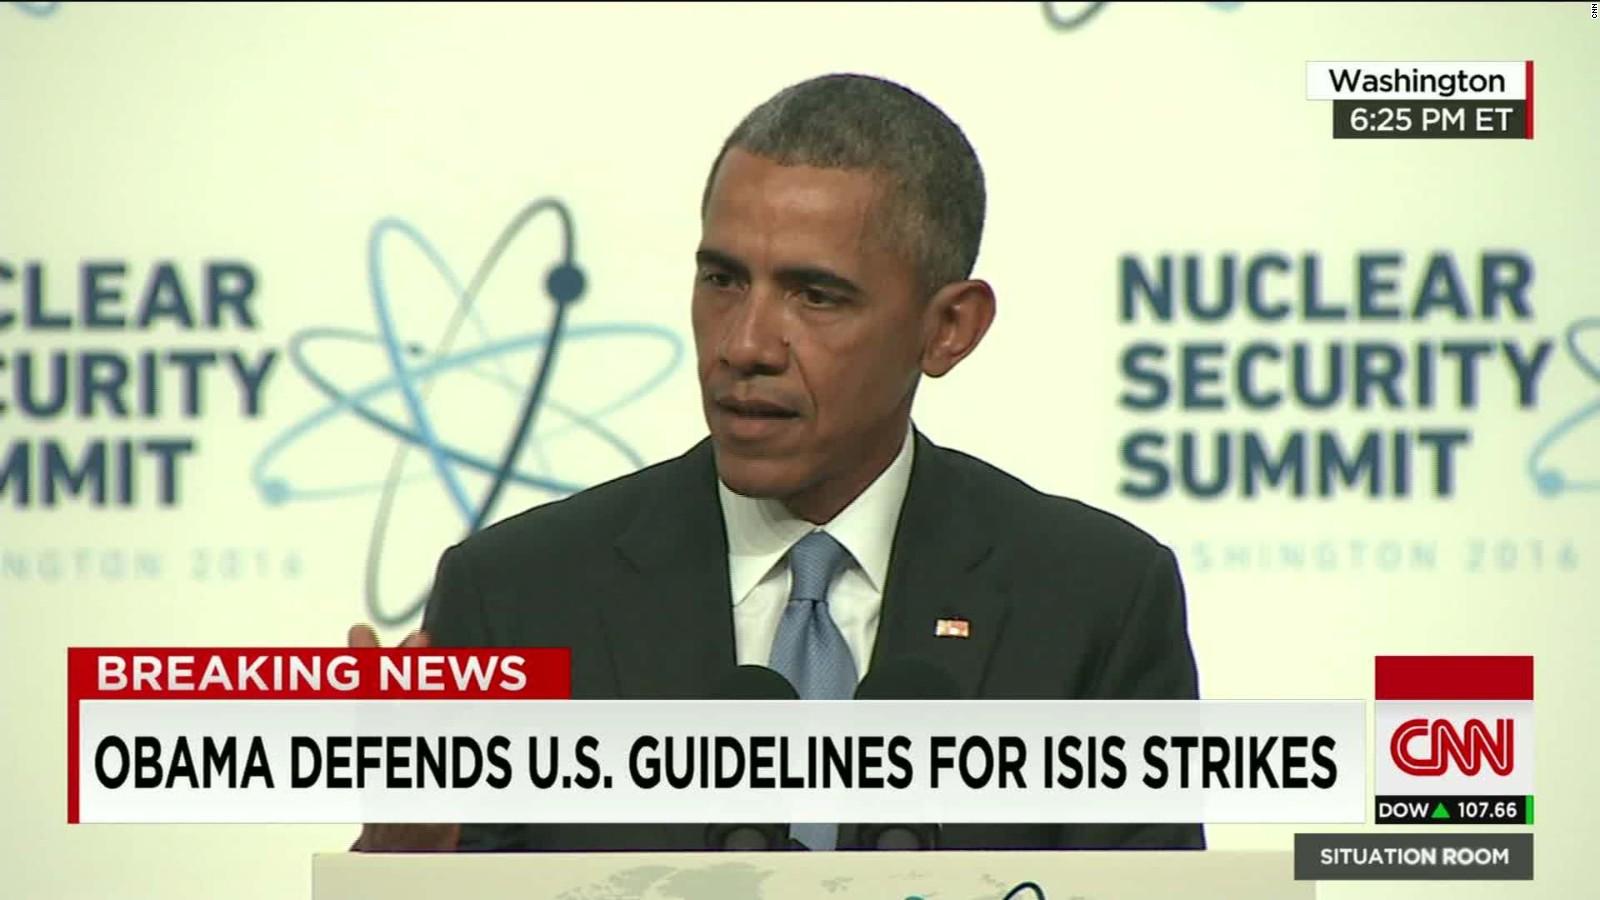 Obama: 'No doubt' U.S. drones have killed civilians - CNN Video